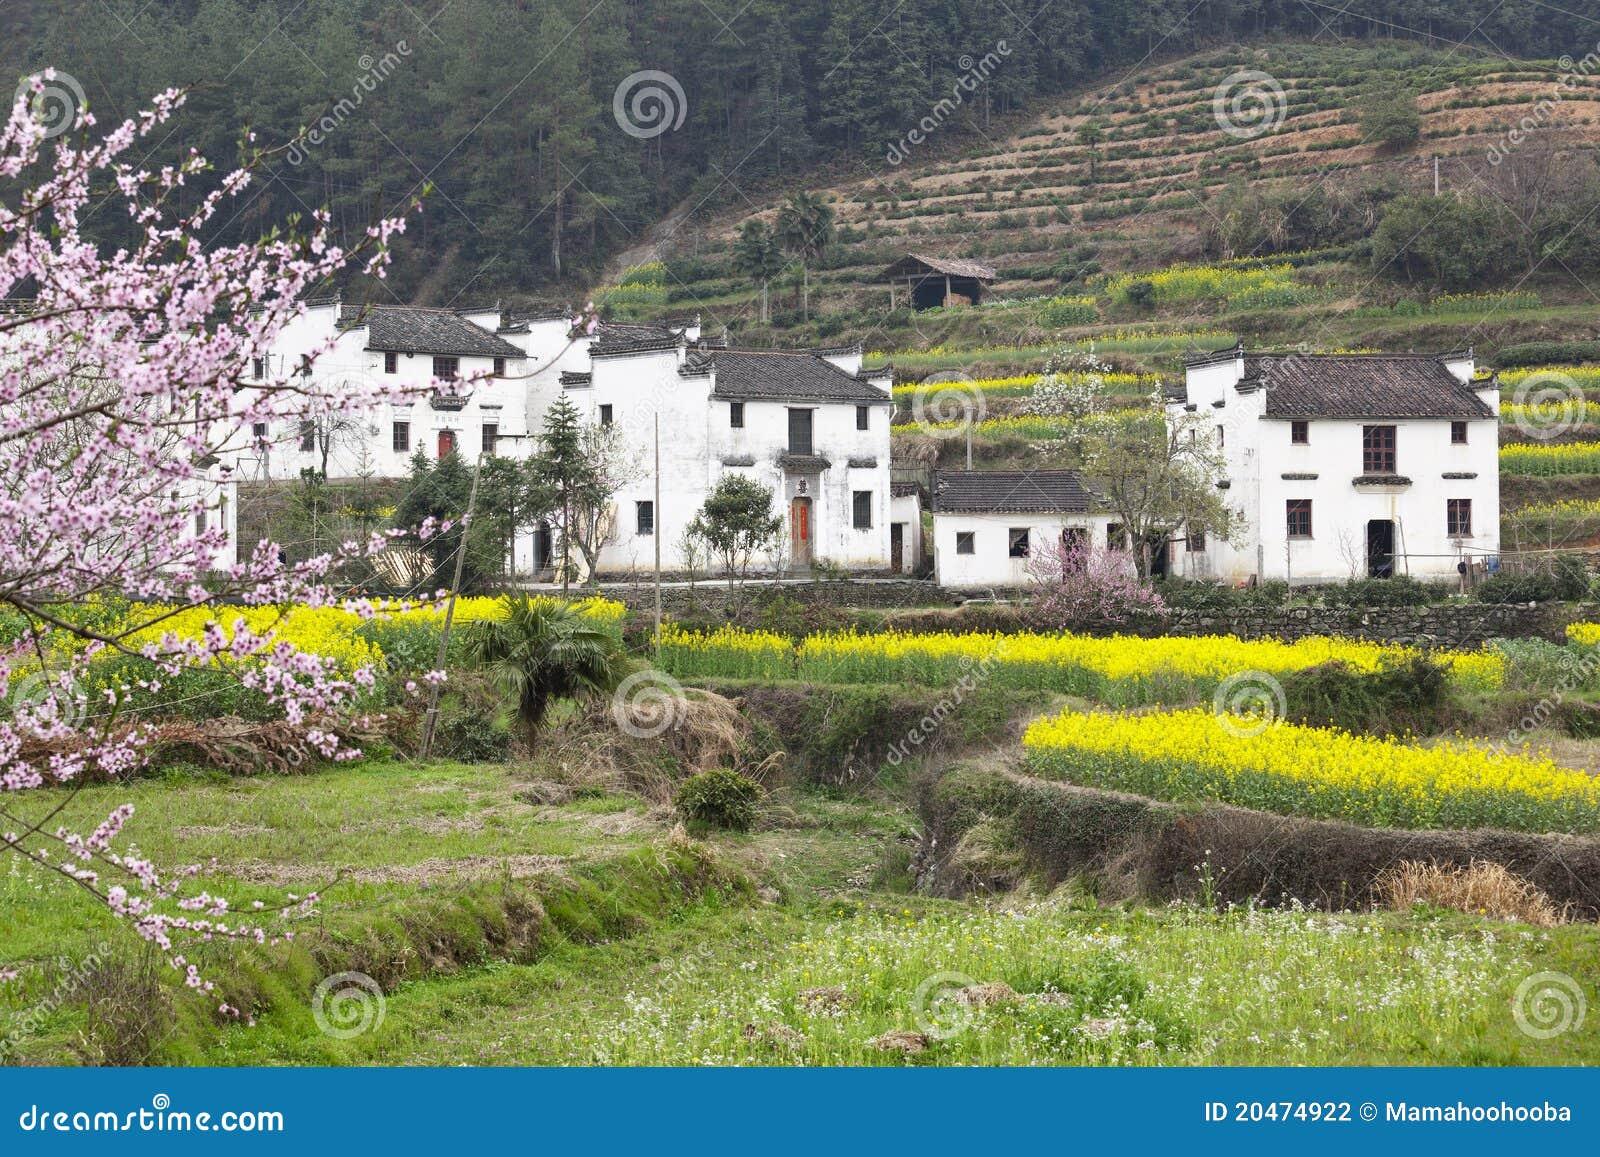 Wuyuan China  city images : Wuyuan, China: landelijke huizen